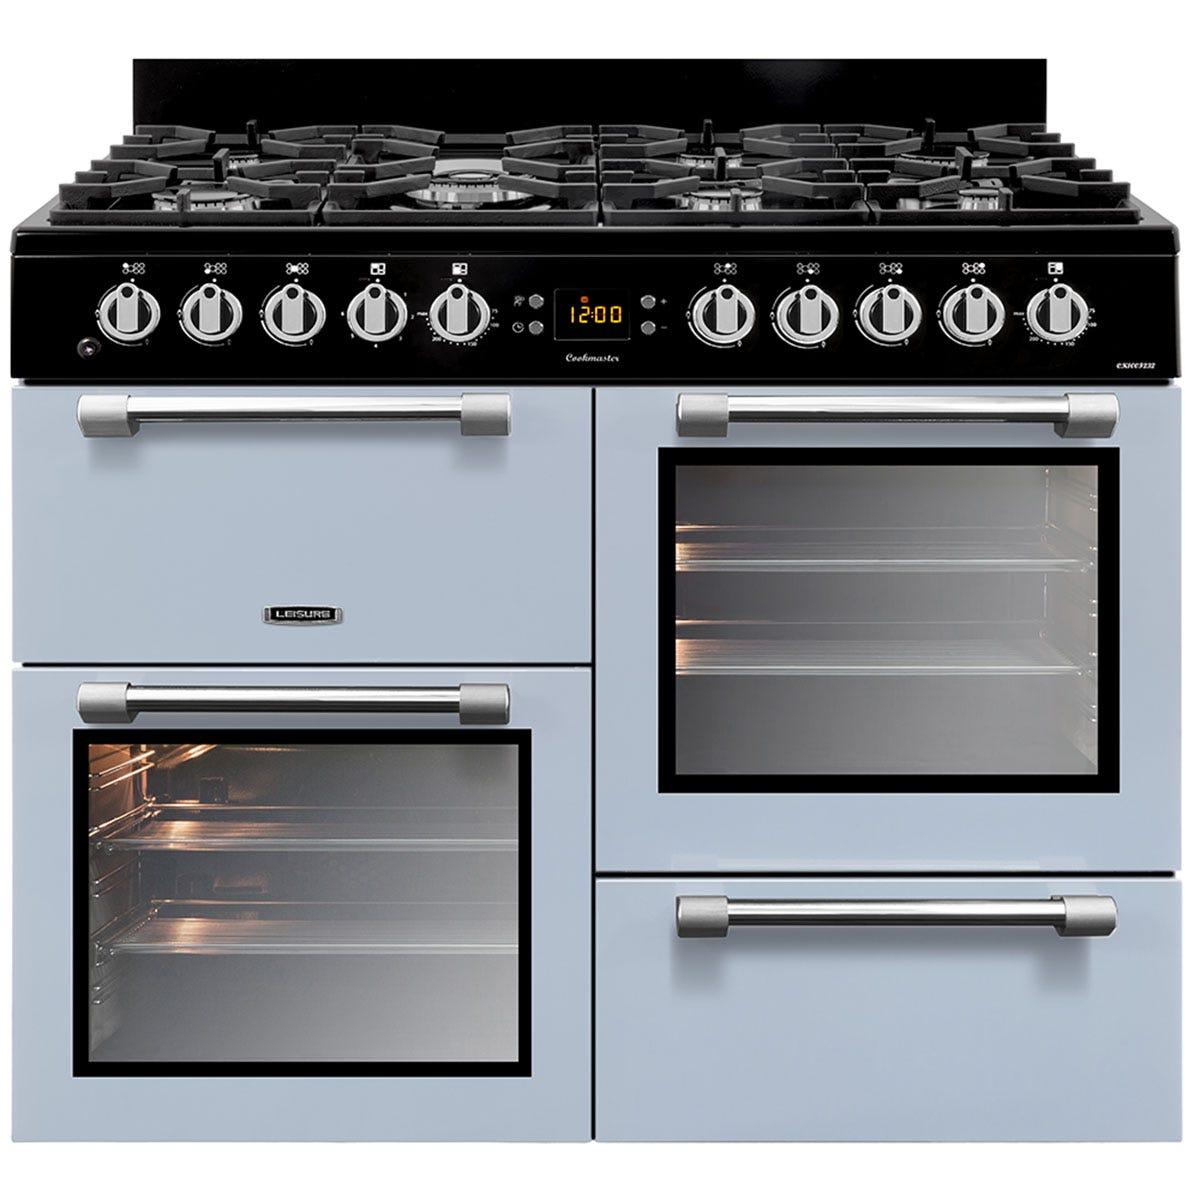 Leisure CK100F232B 100cm Cookmaster Dual Fuel Range Cooker - Blue